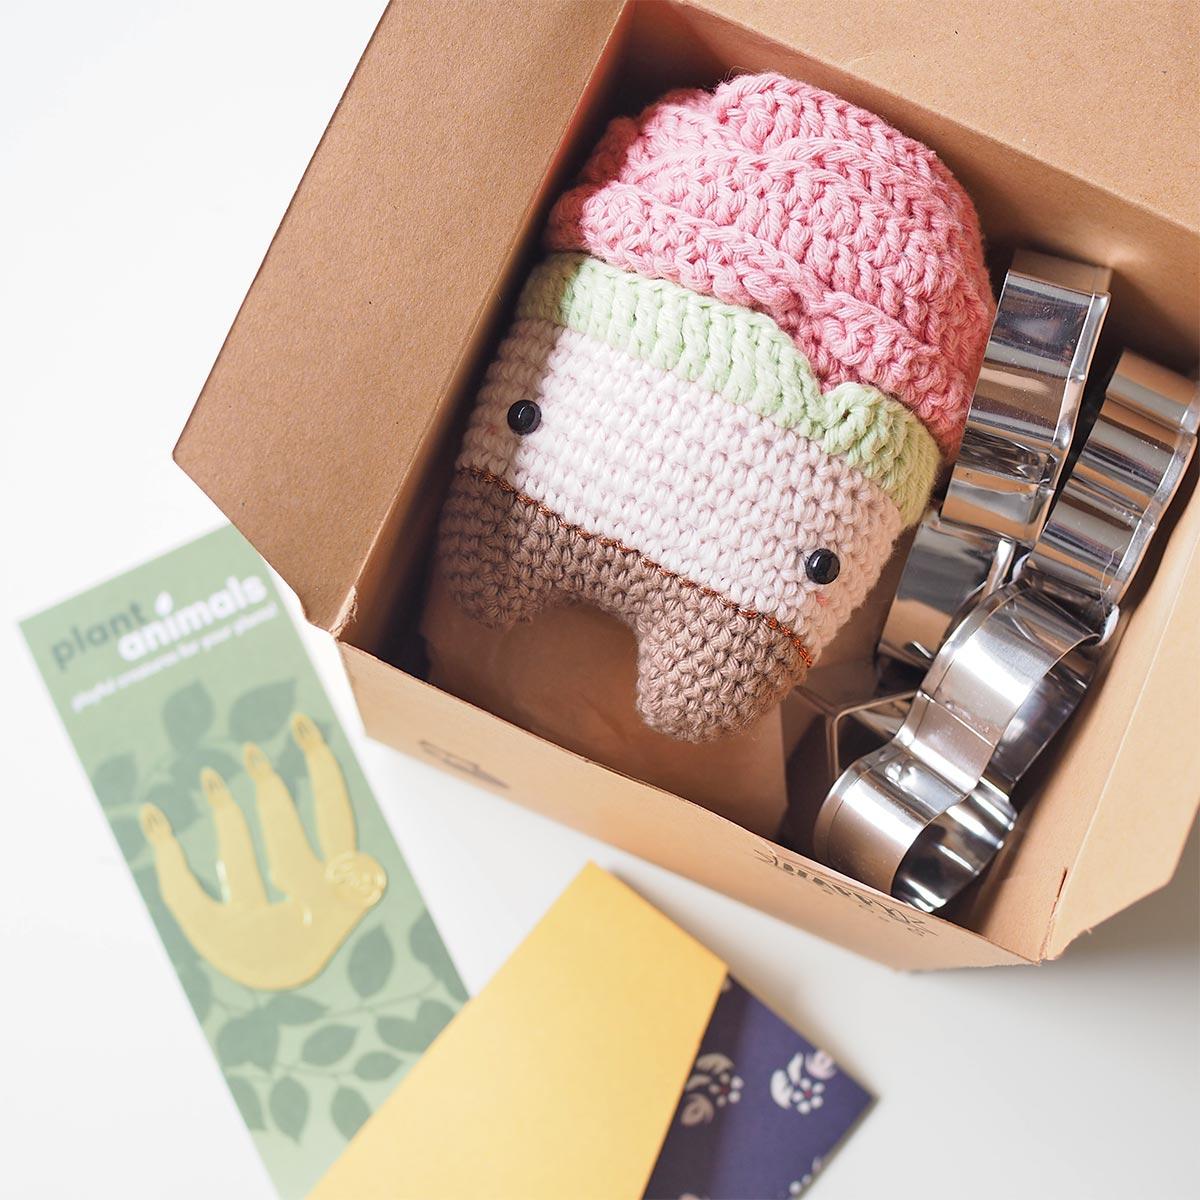 petits cadeaux Elise @teaforyoubijoux